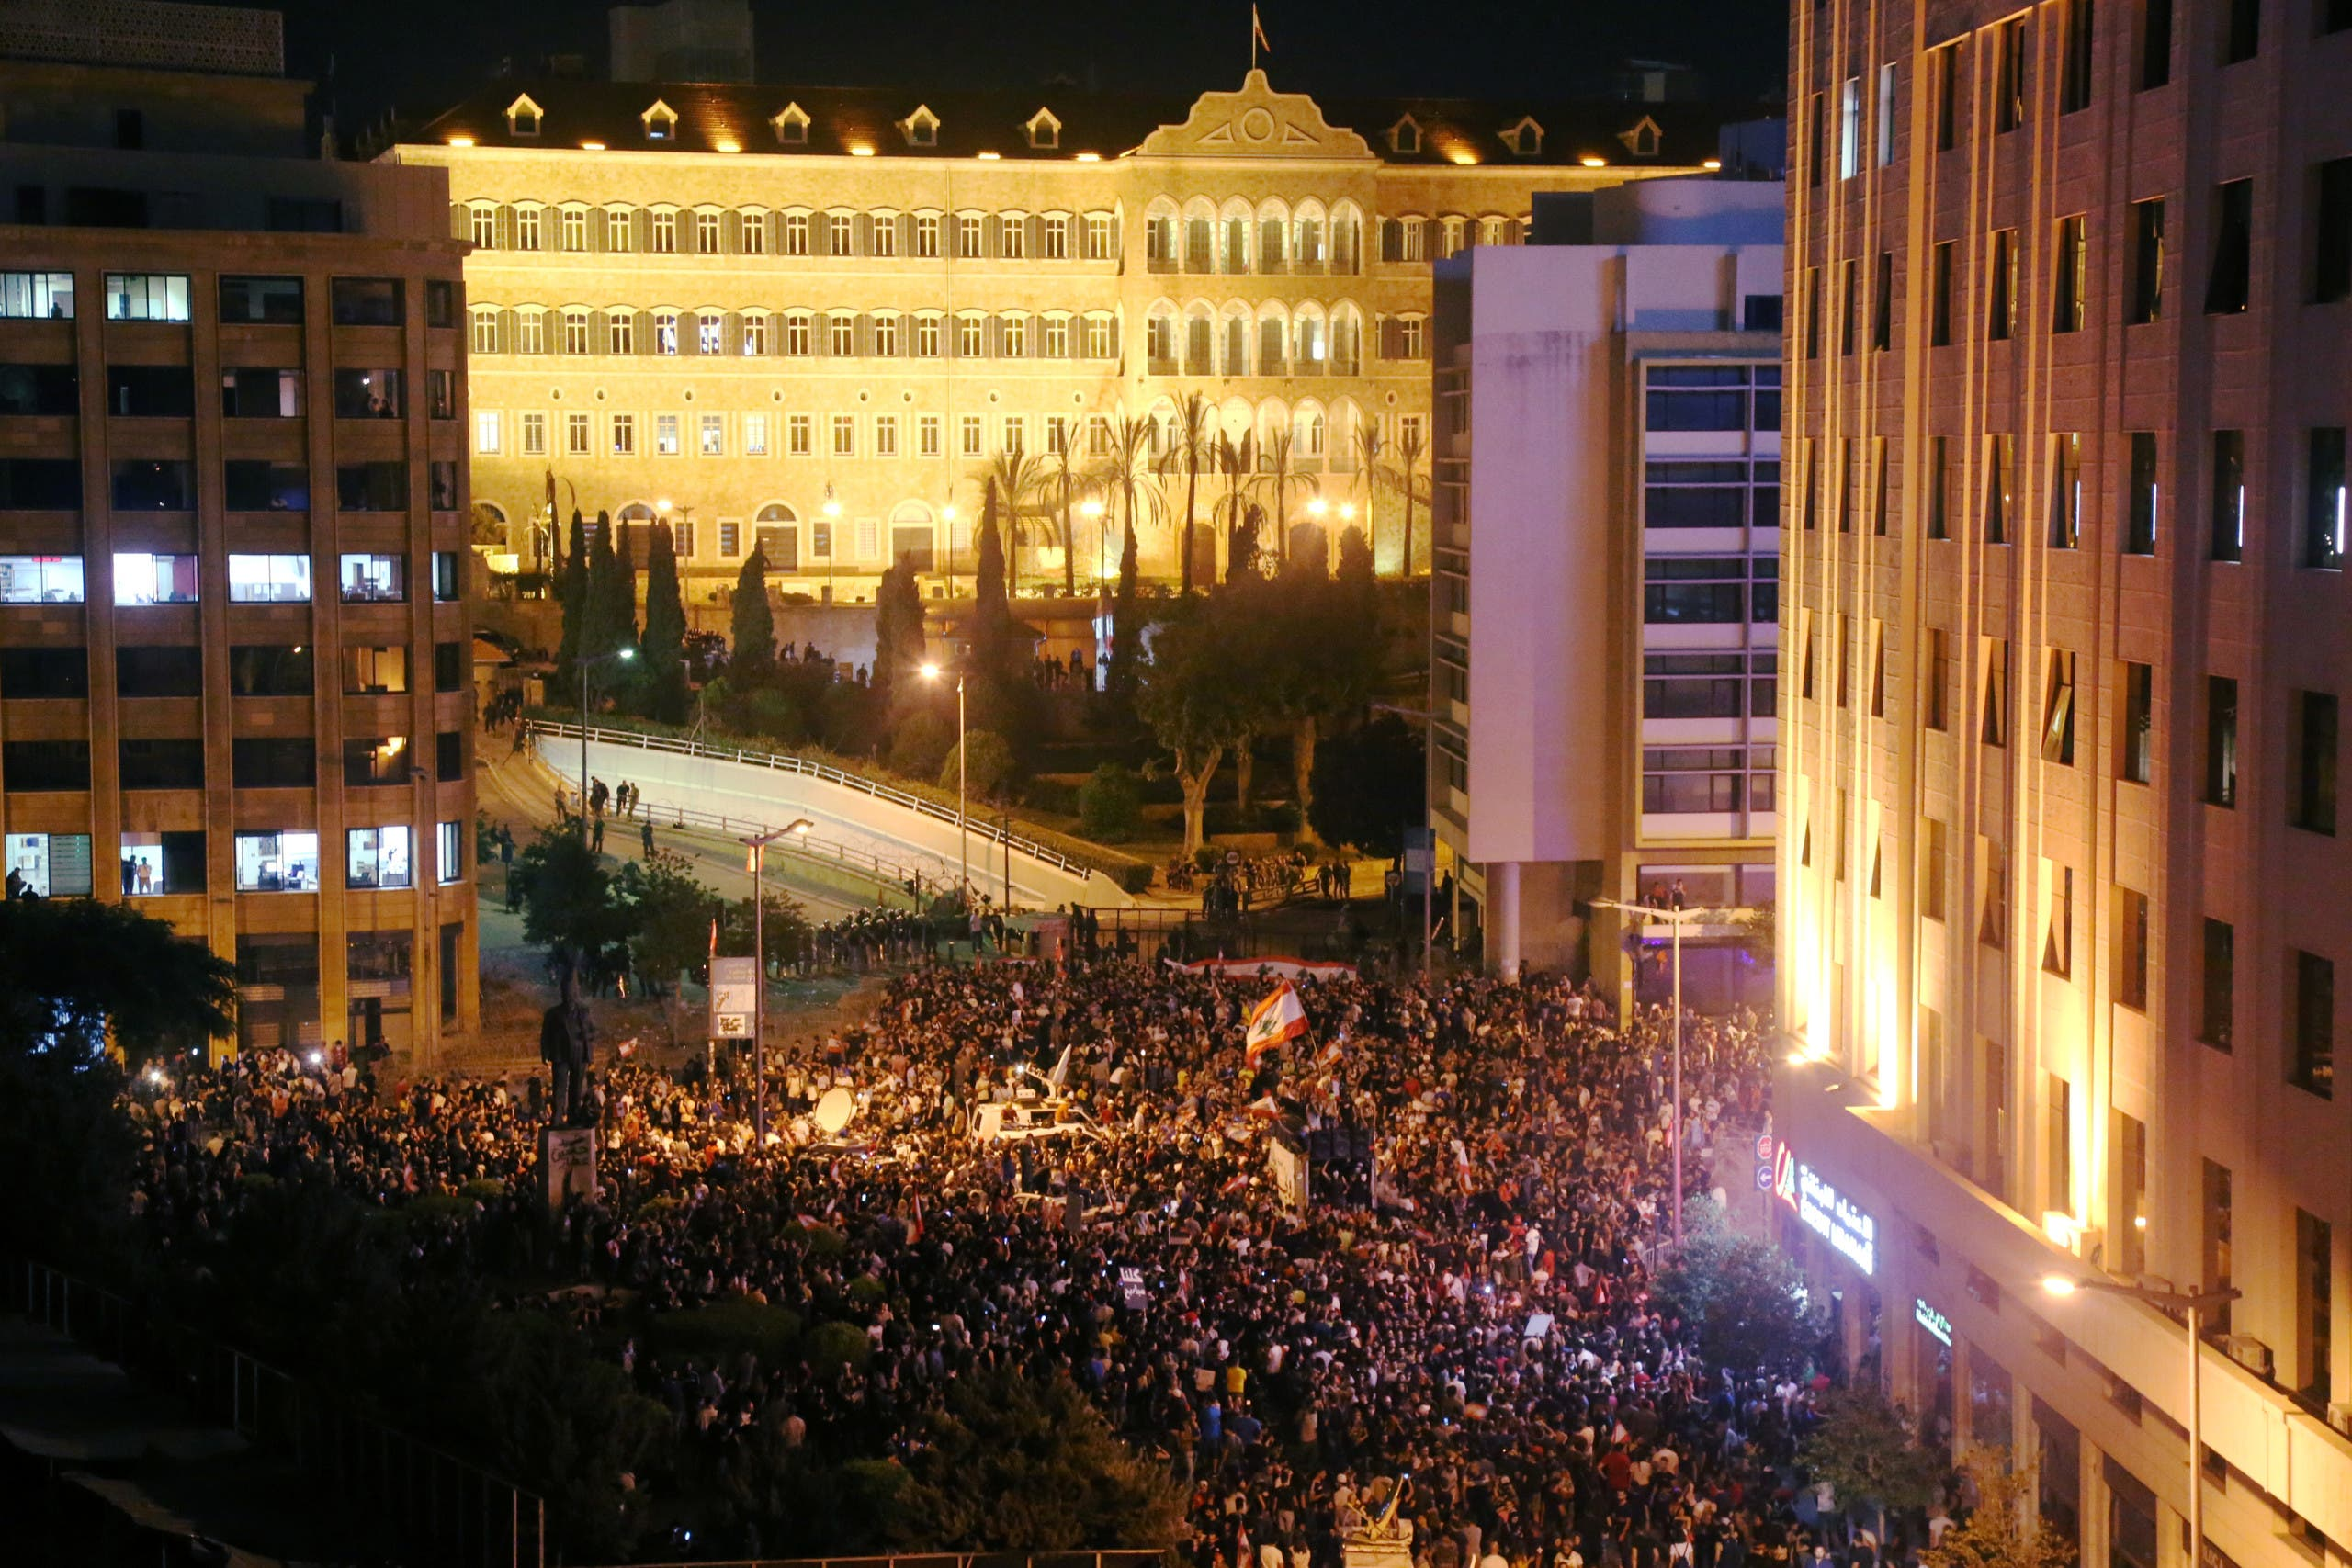 من احتجاجات وسط بيروت